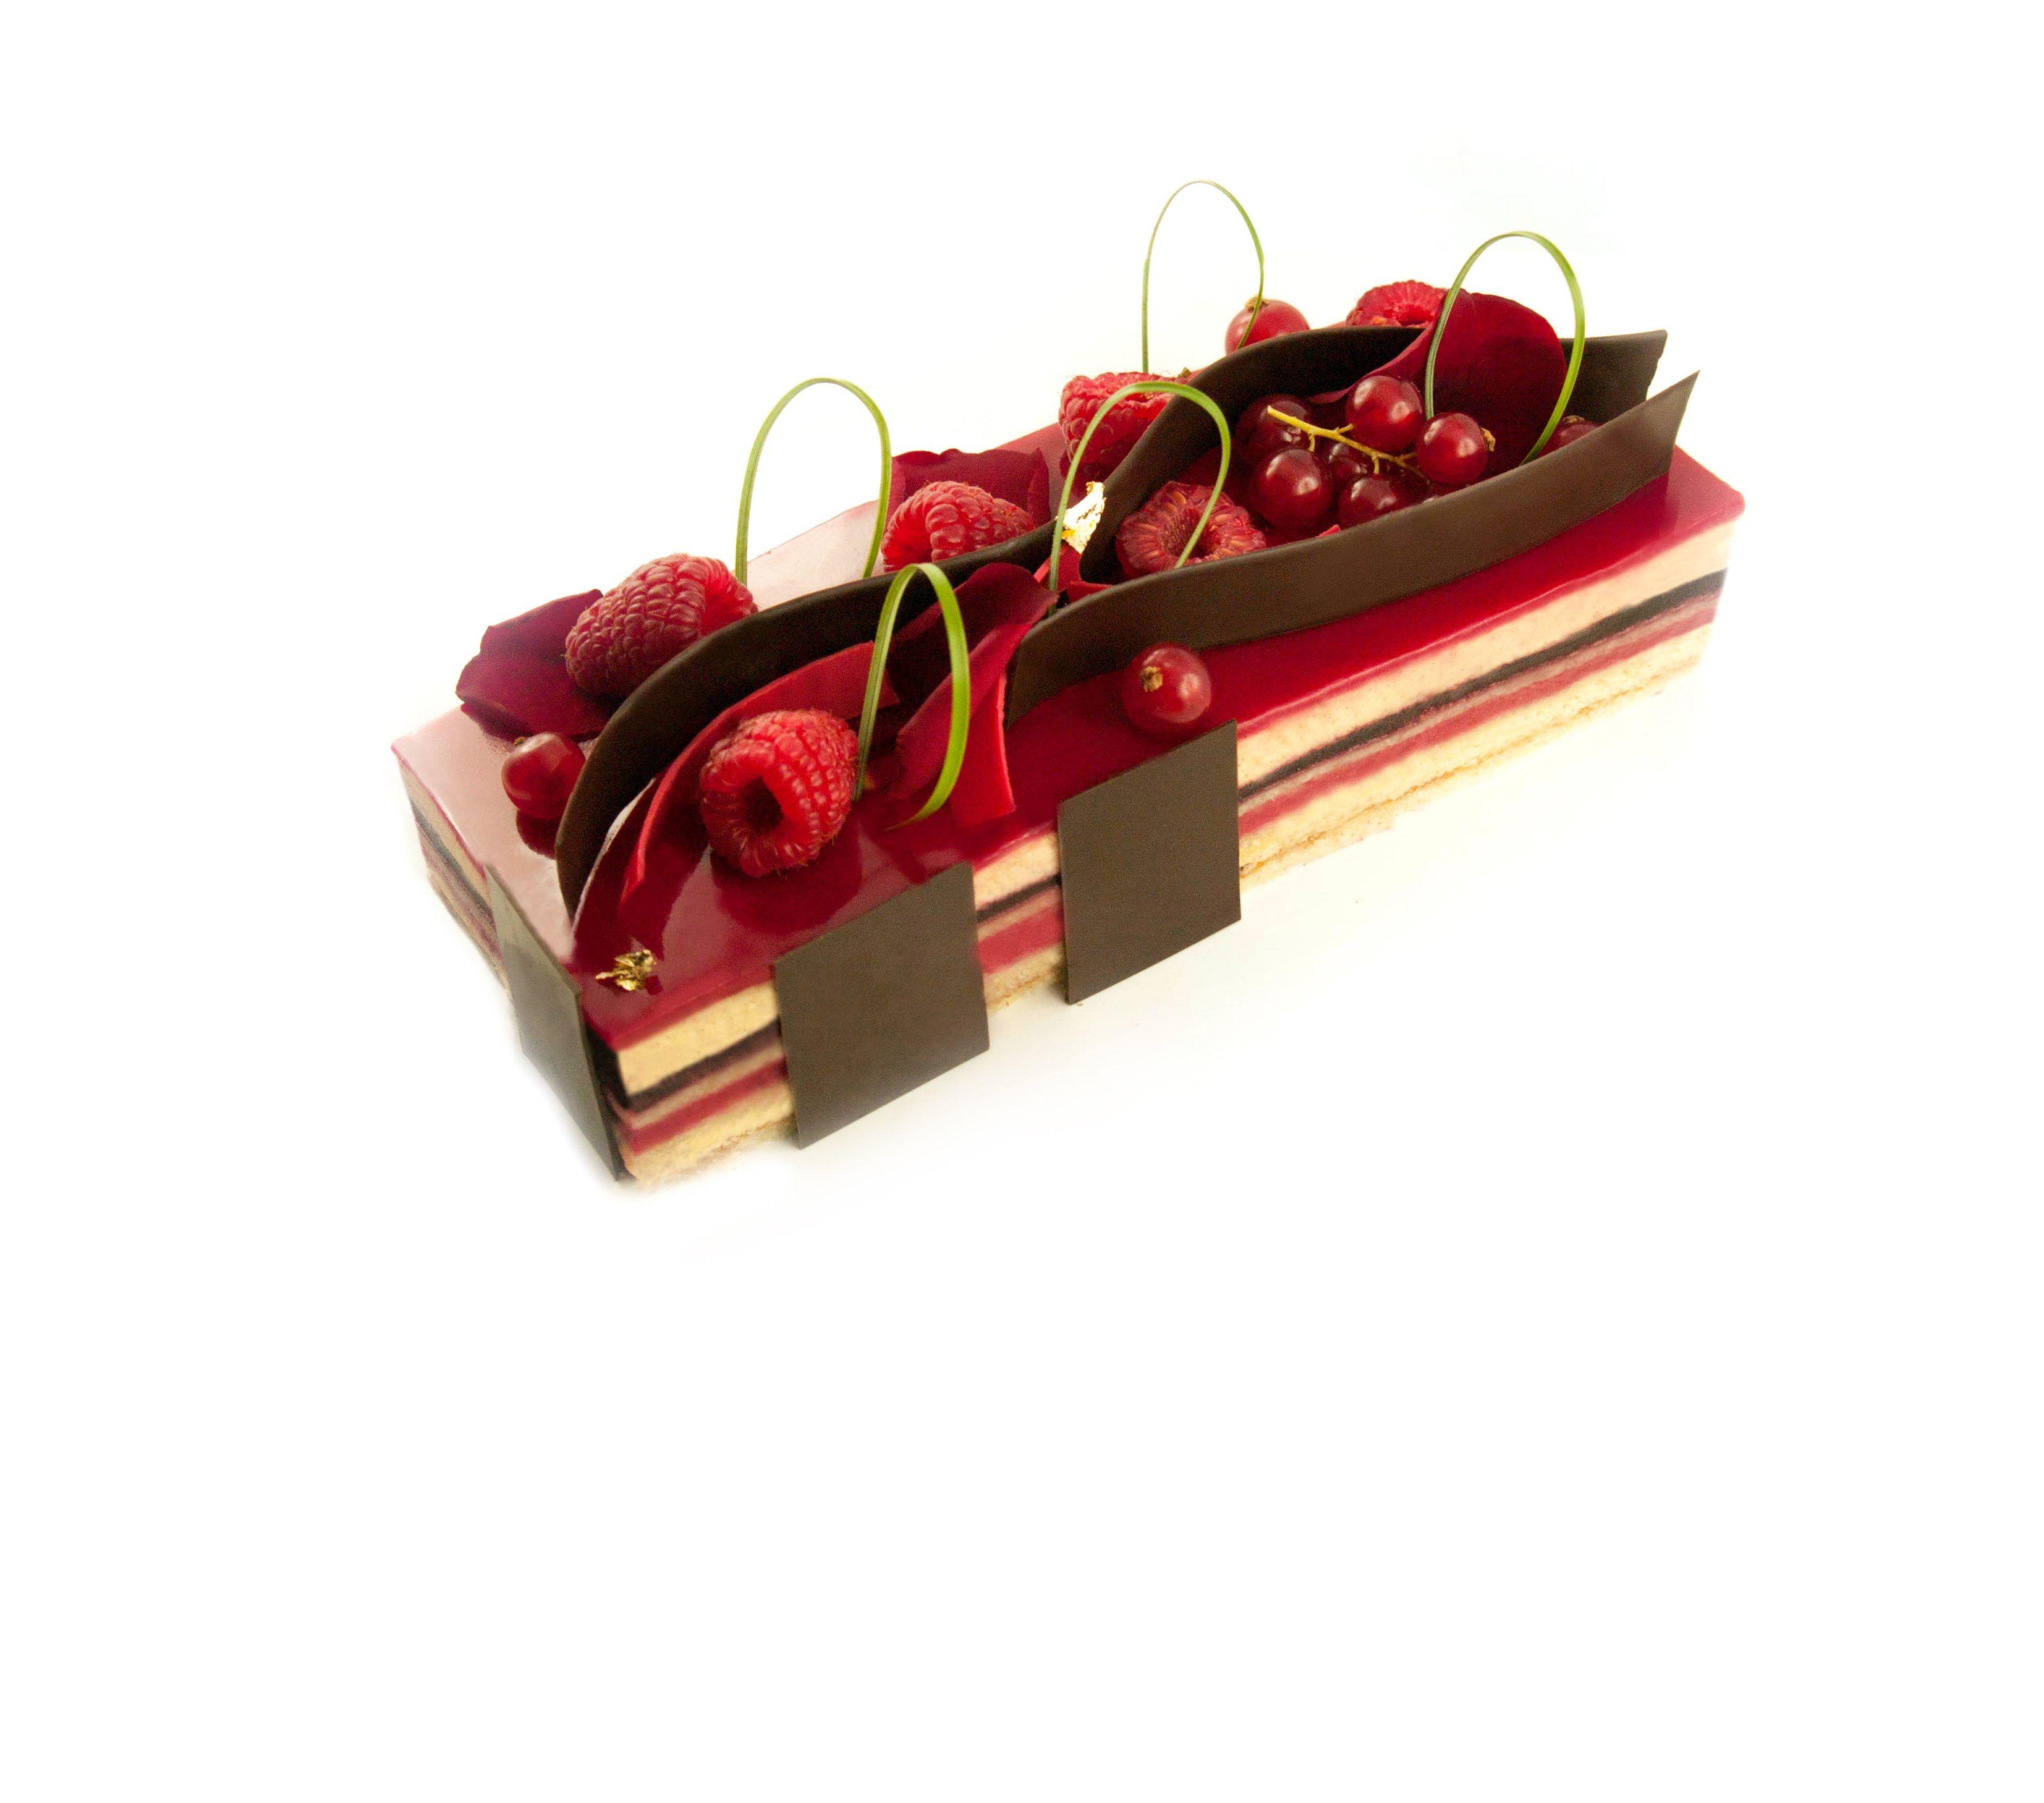 Opéra fruits rouge : Biscuit joconde vanille / Sirop framboise / Confit framboise / Crème au beurre vanille / Glaçage rouge